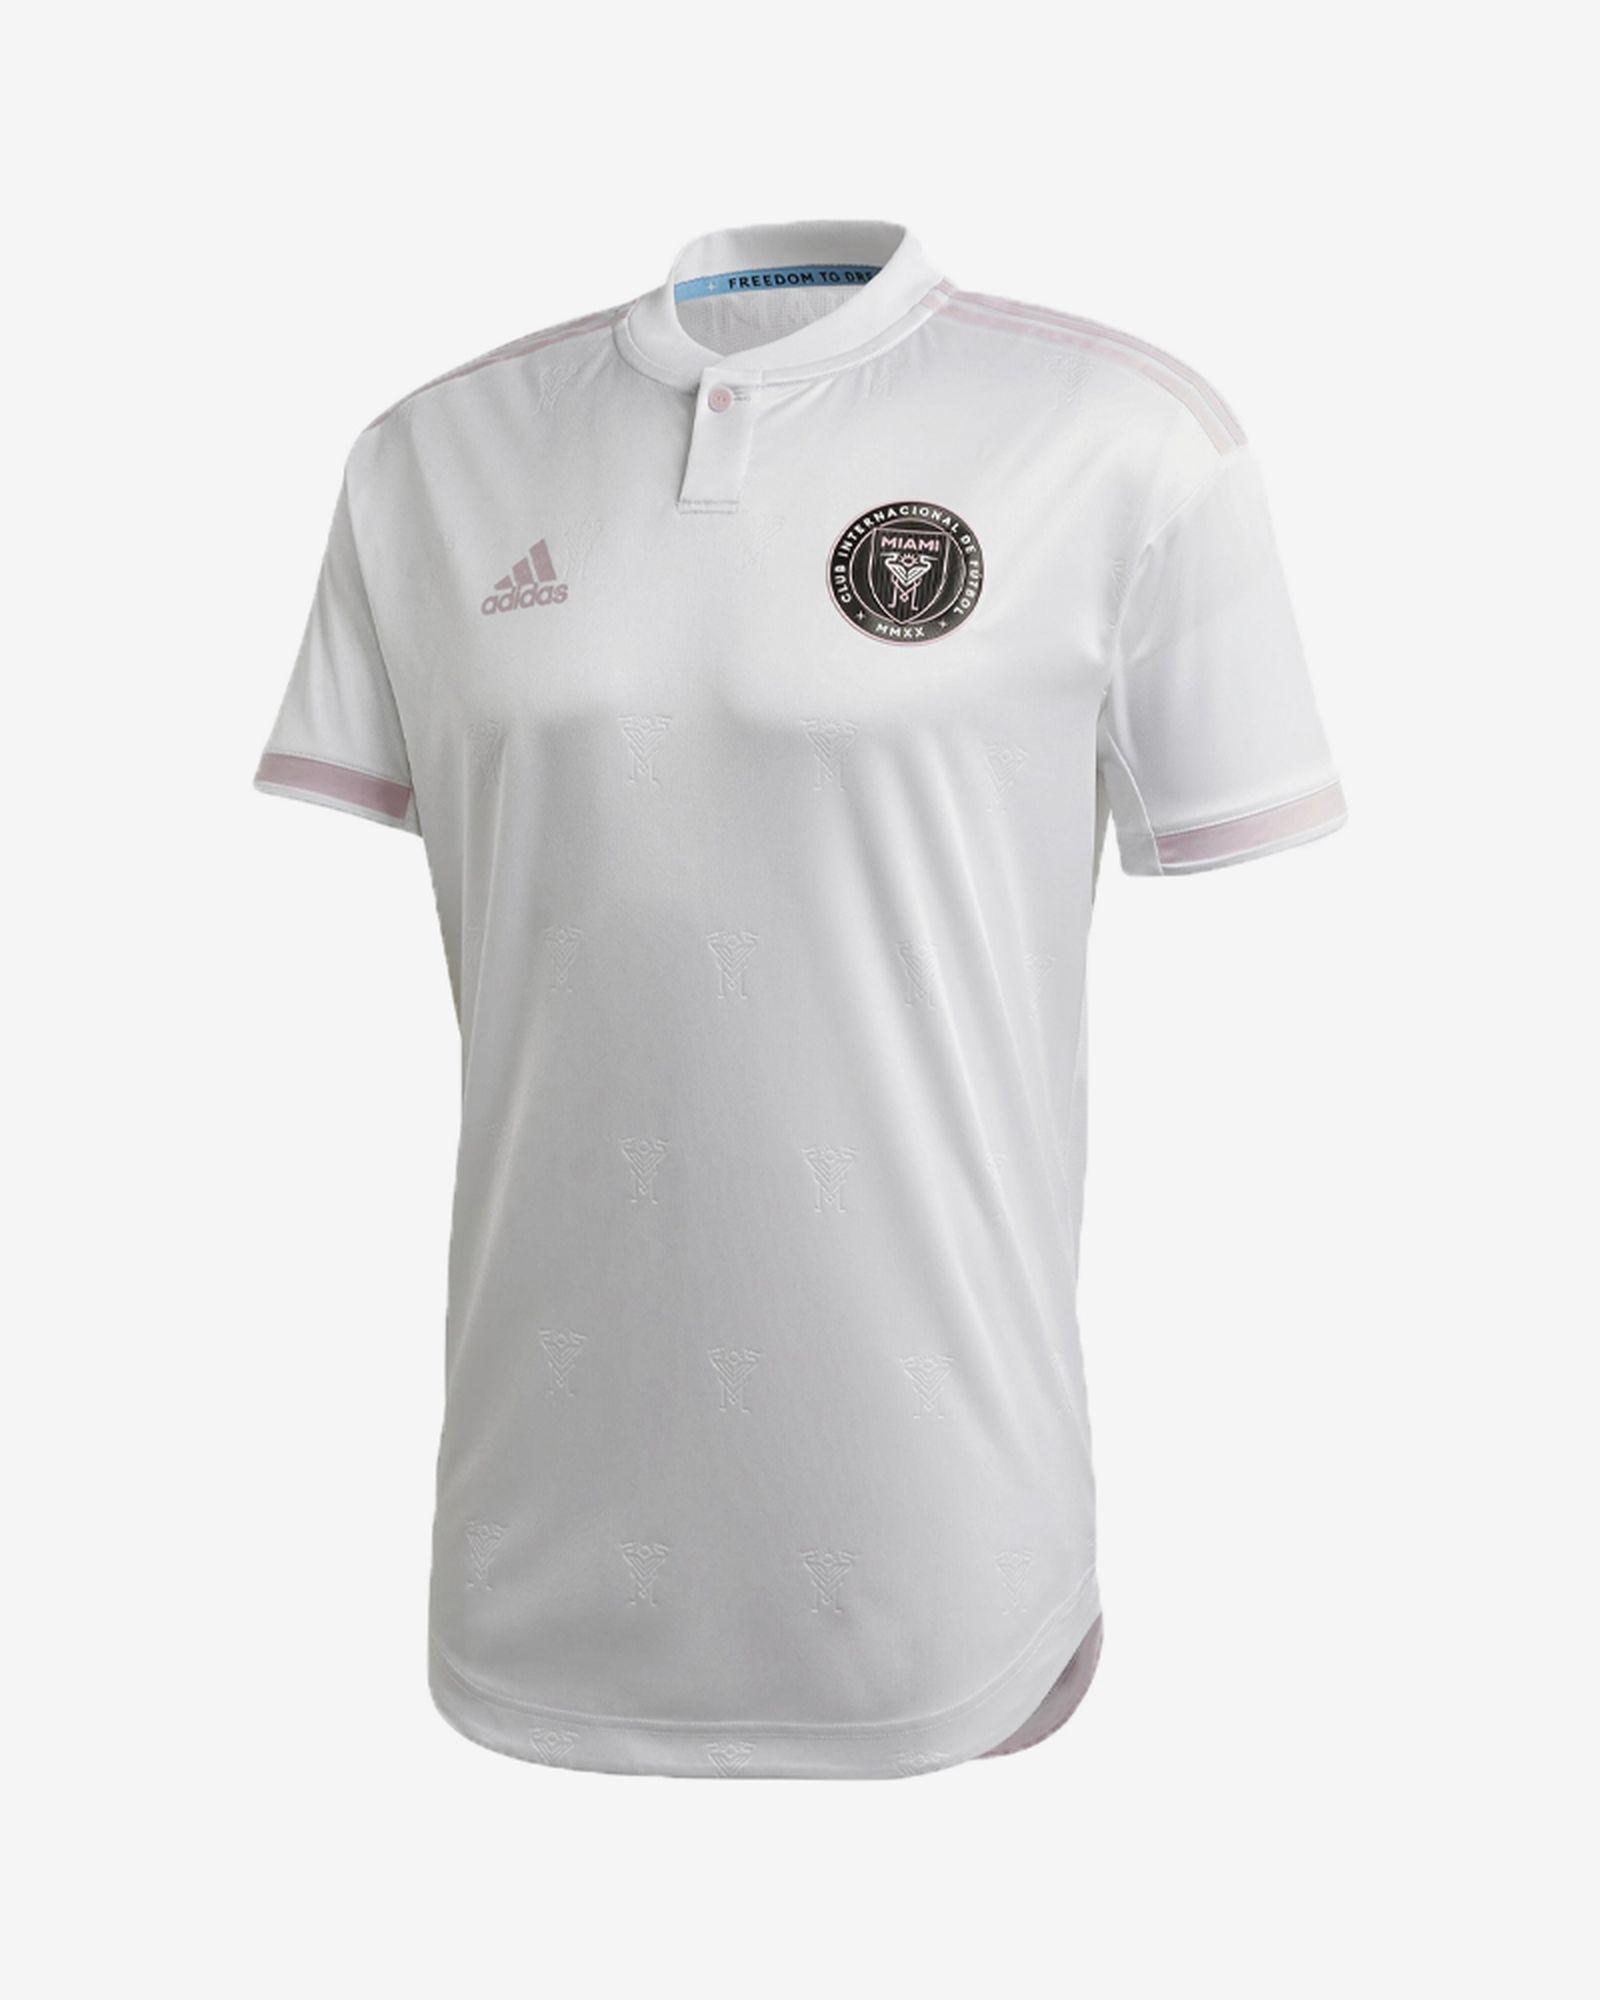 football-shirts-2020-review-20